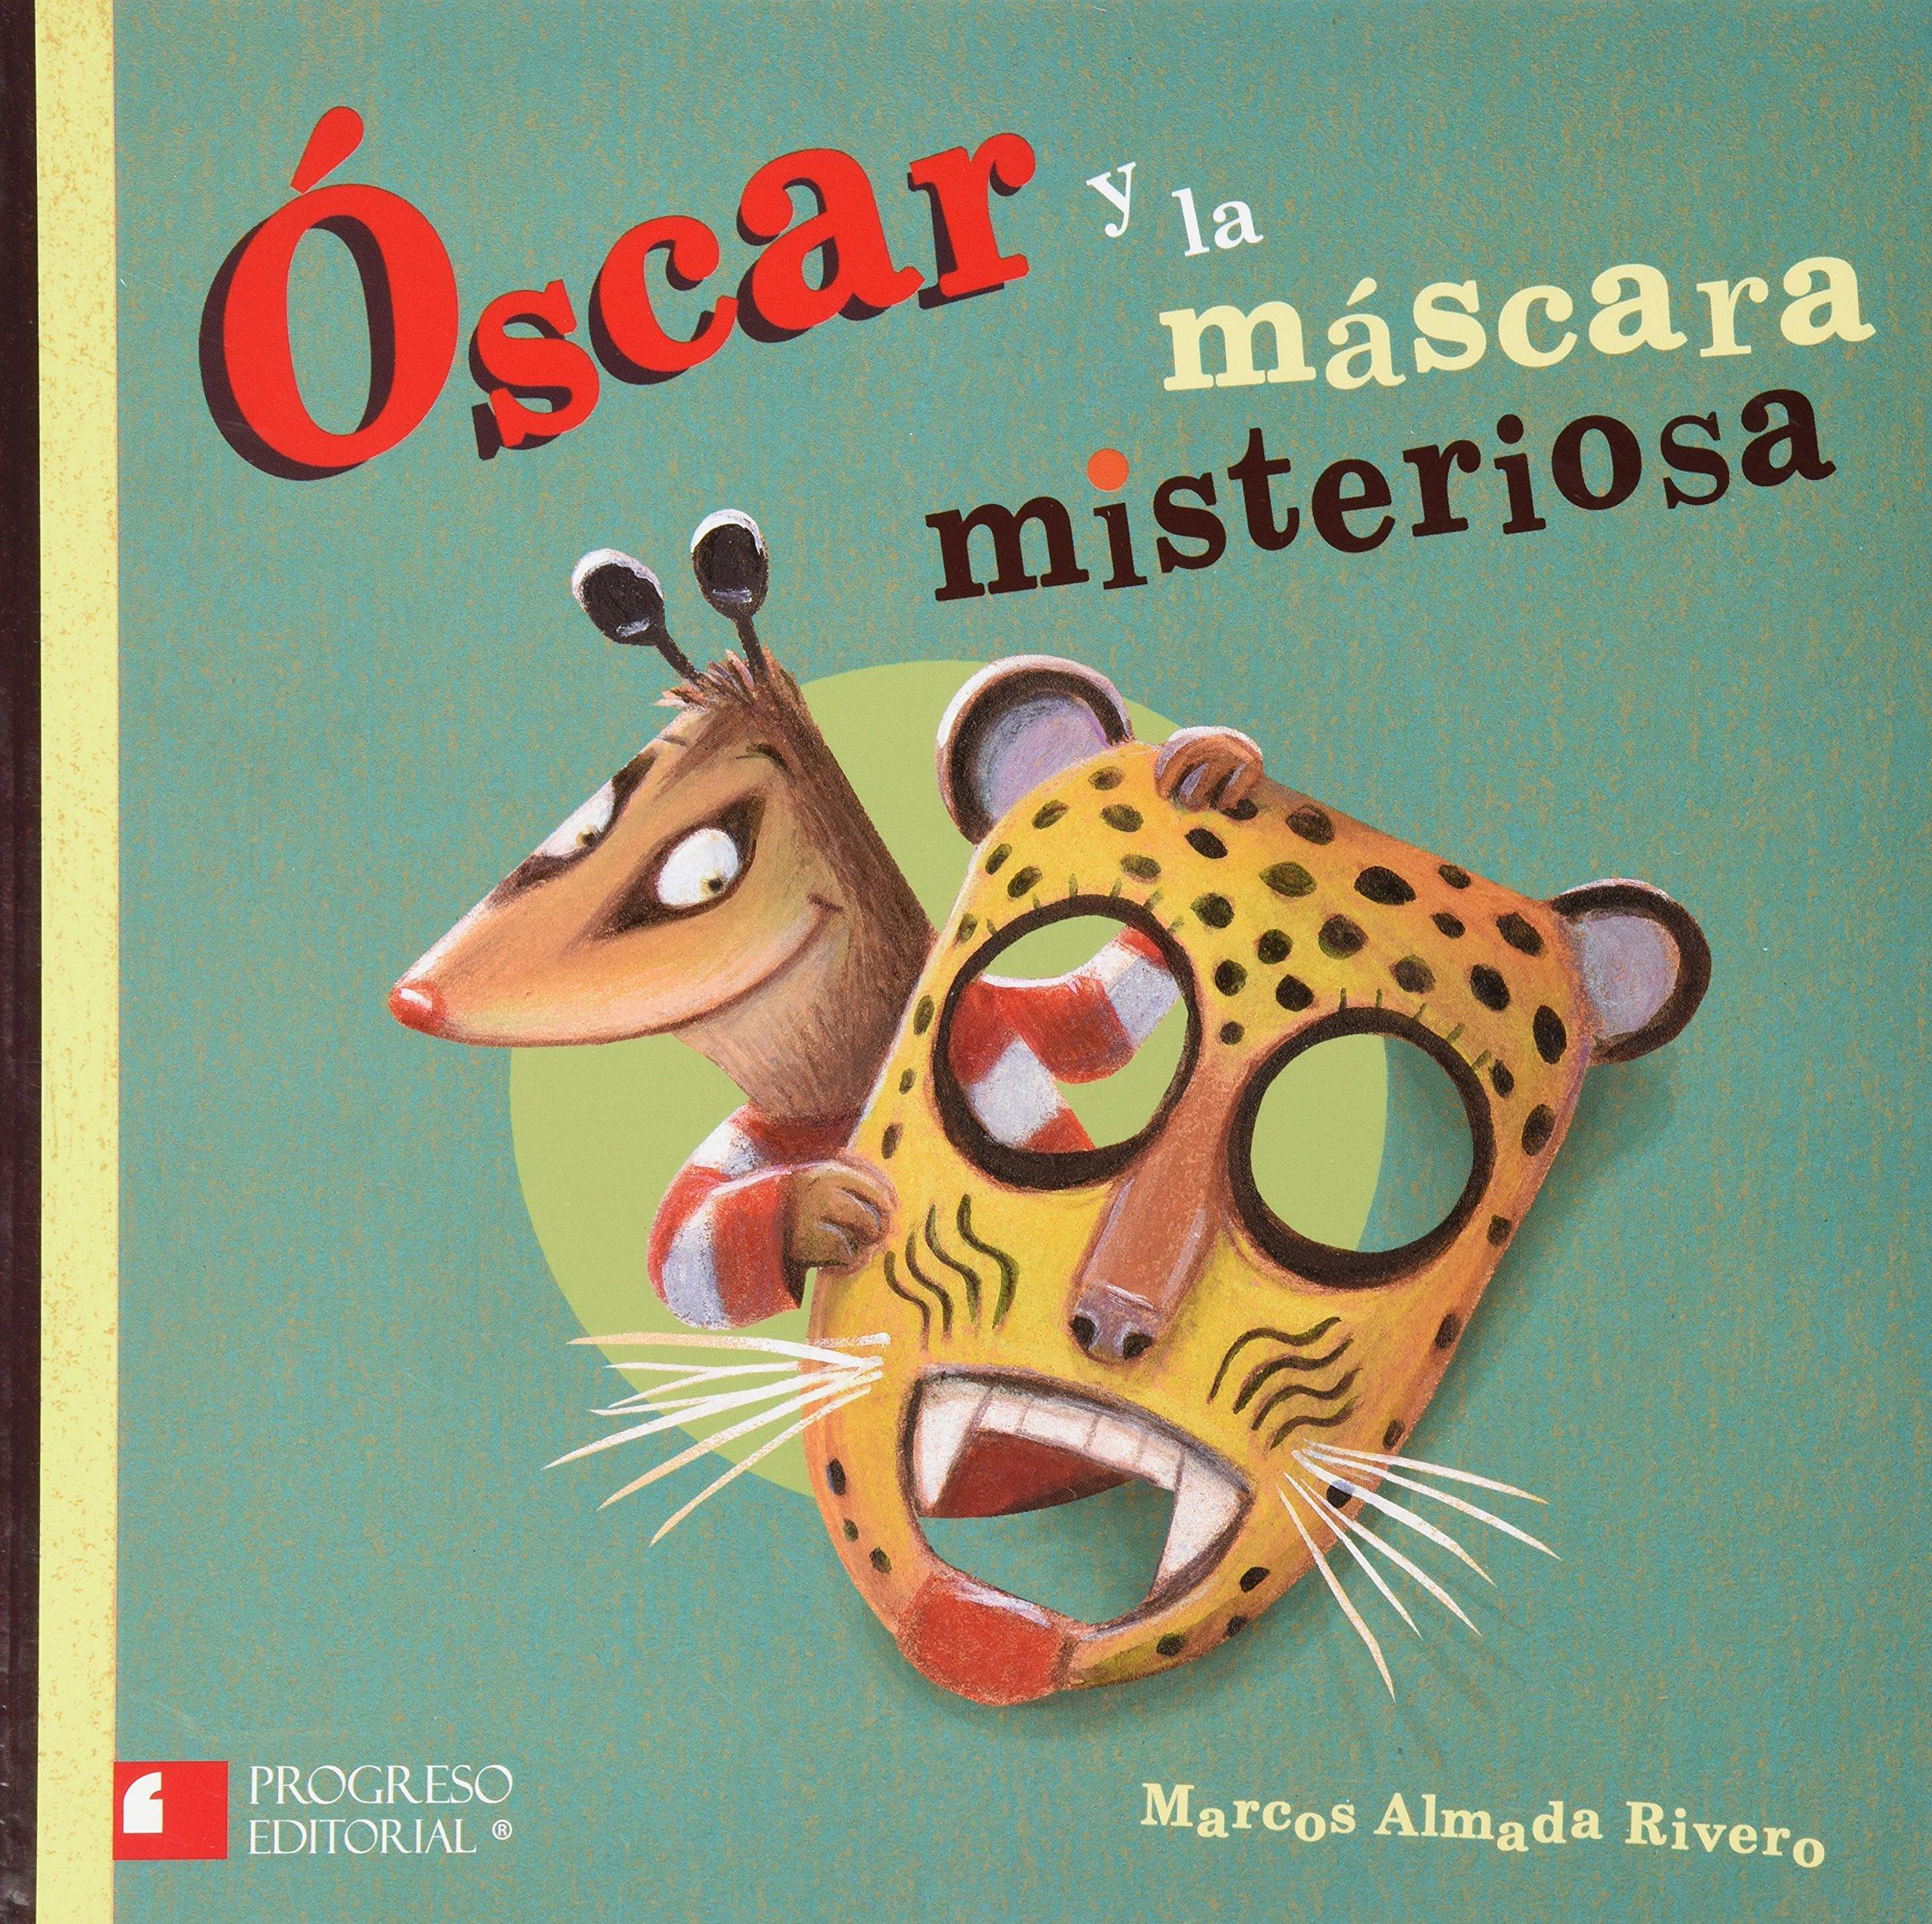 OSCAR Y LA MASCARA MISTERIOSA: MARCOS ALMADA RIVERO: 9786078380428: Amazon.com: Books